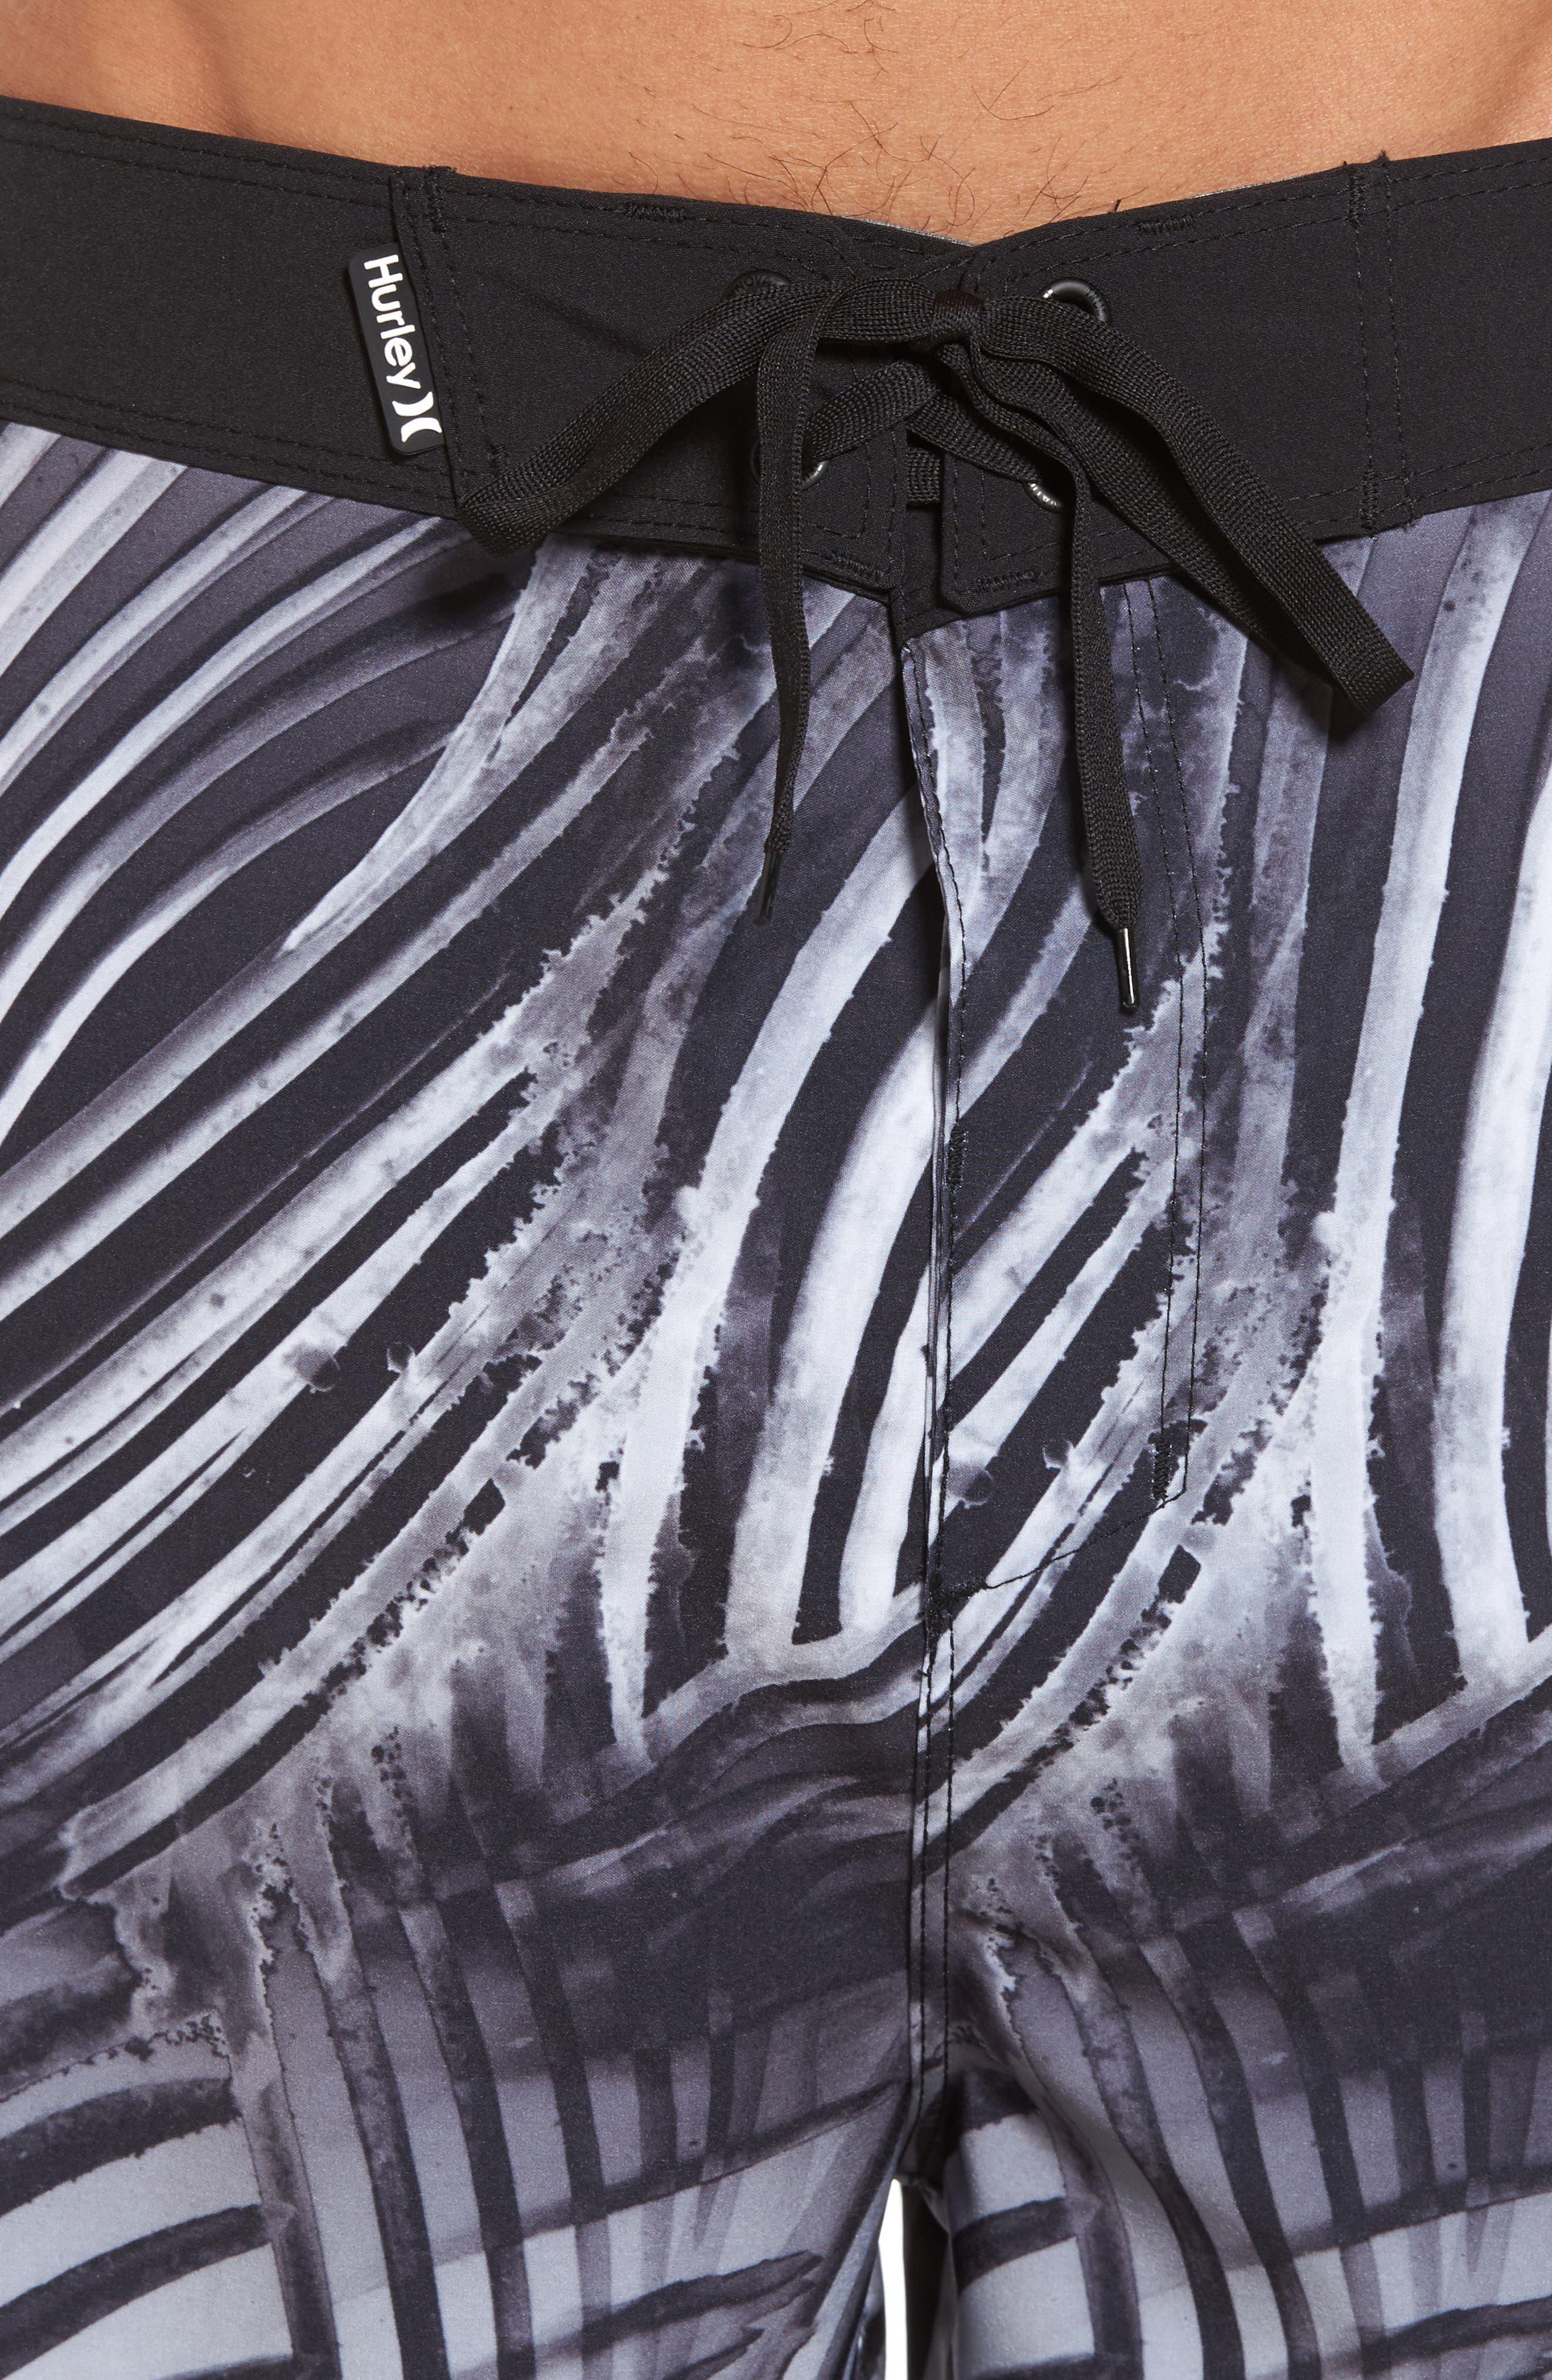 Phantom Crest Board Shorts,                             Alternate thumbnail 4, color,                             Black